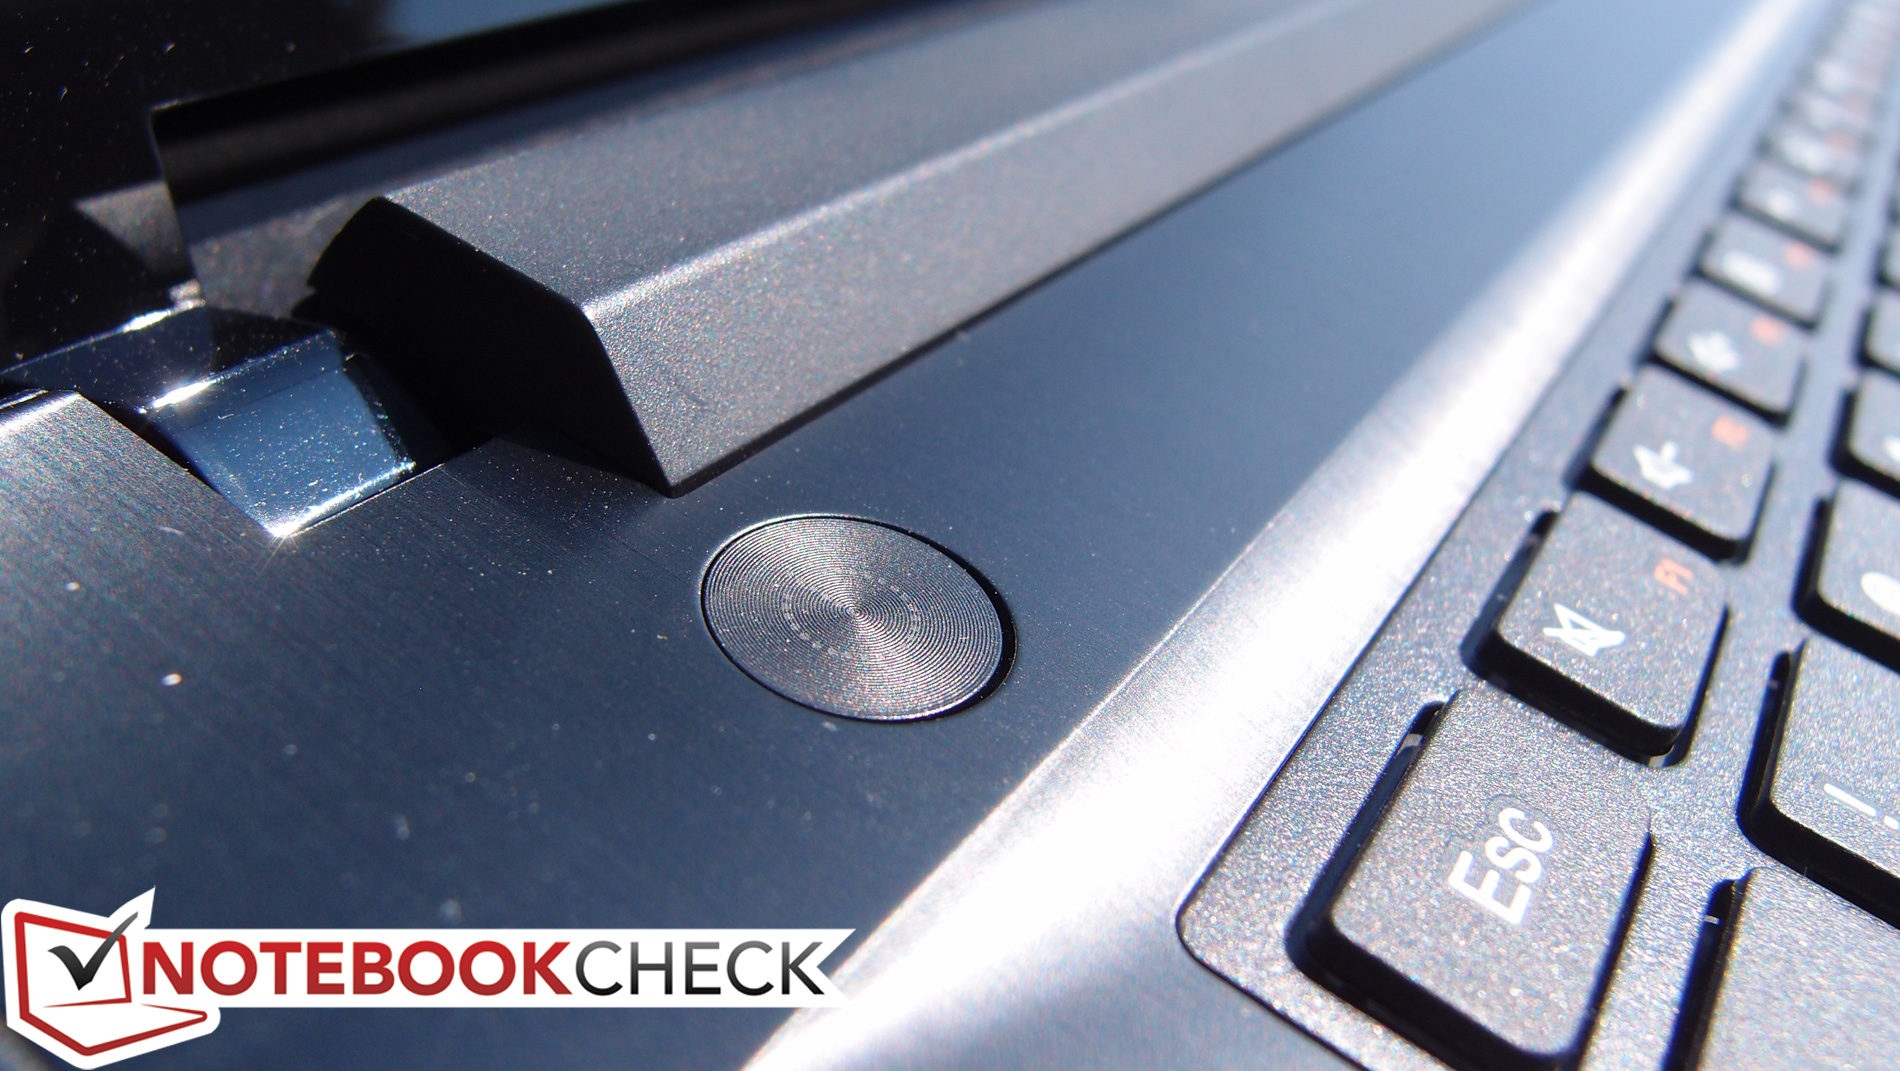 Notebook samsung kaskus - The Palm Rest Area Is Sleek